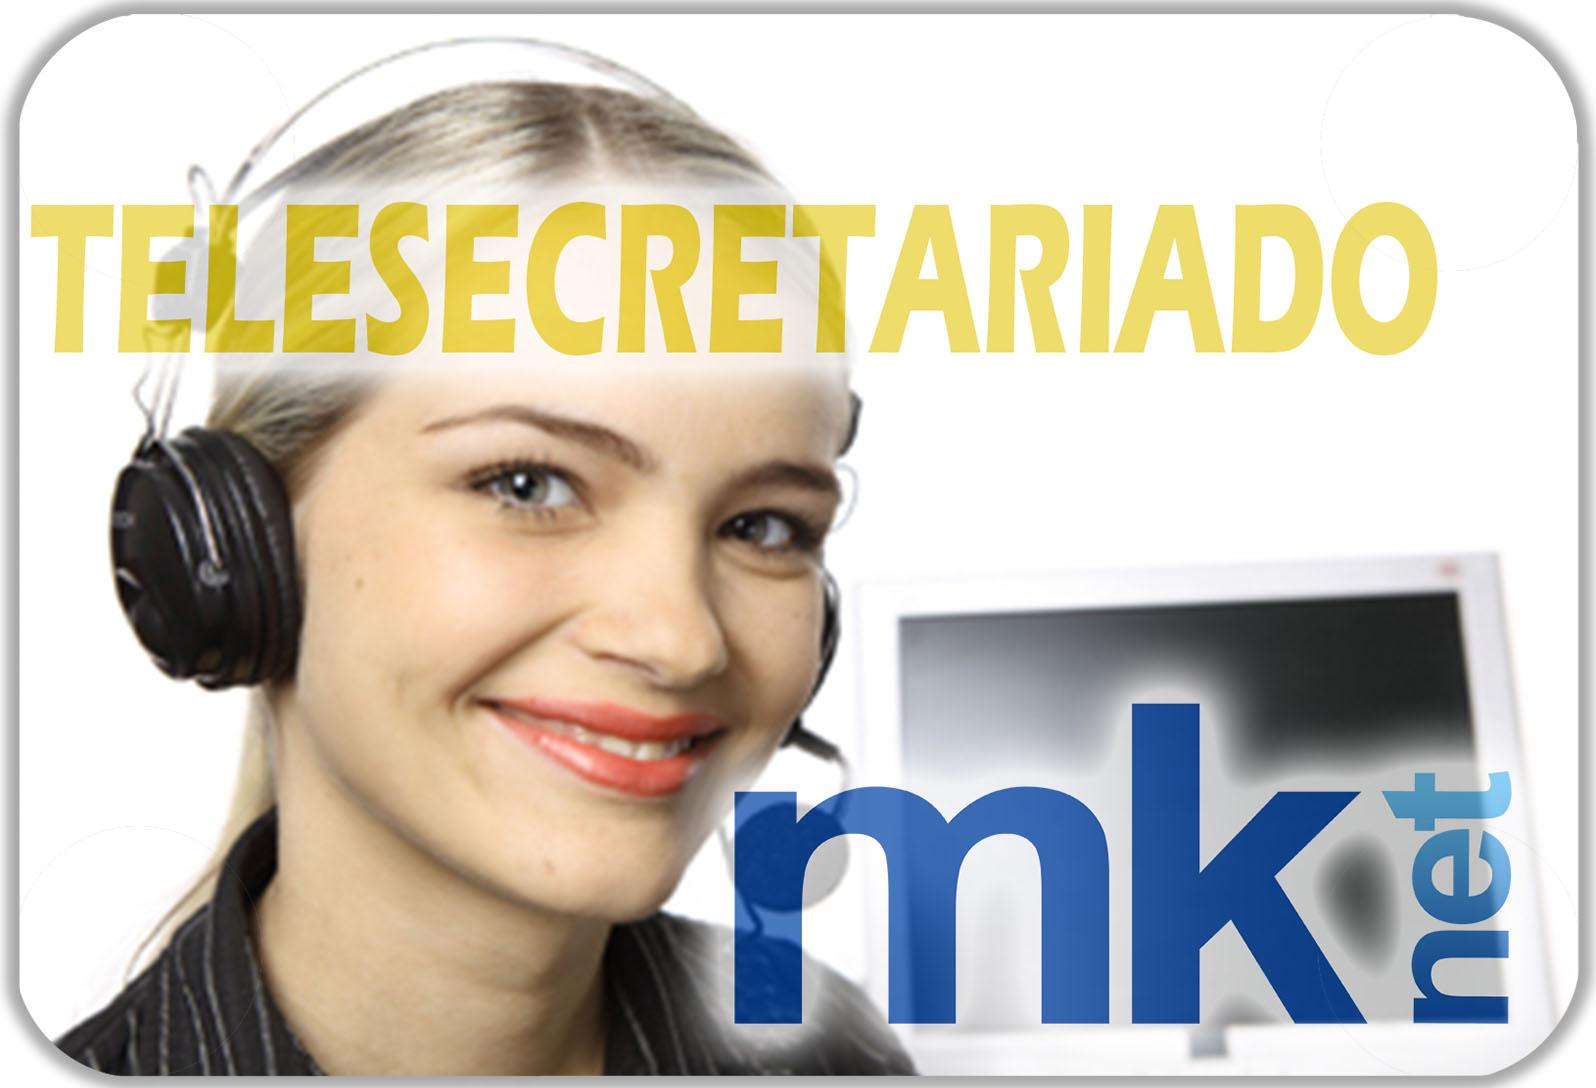 Telesecretariado